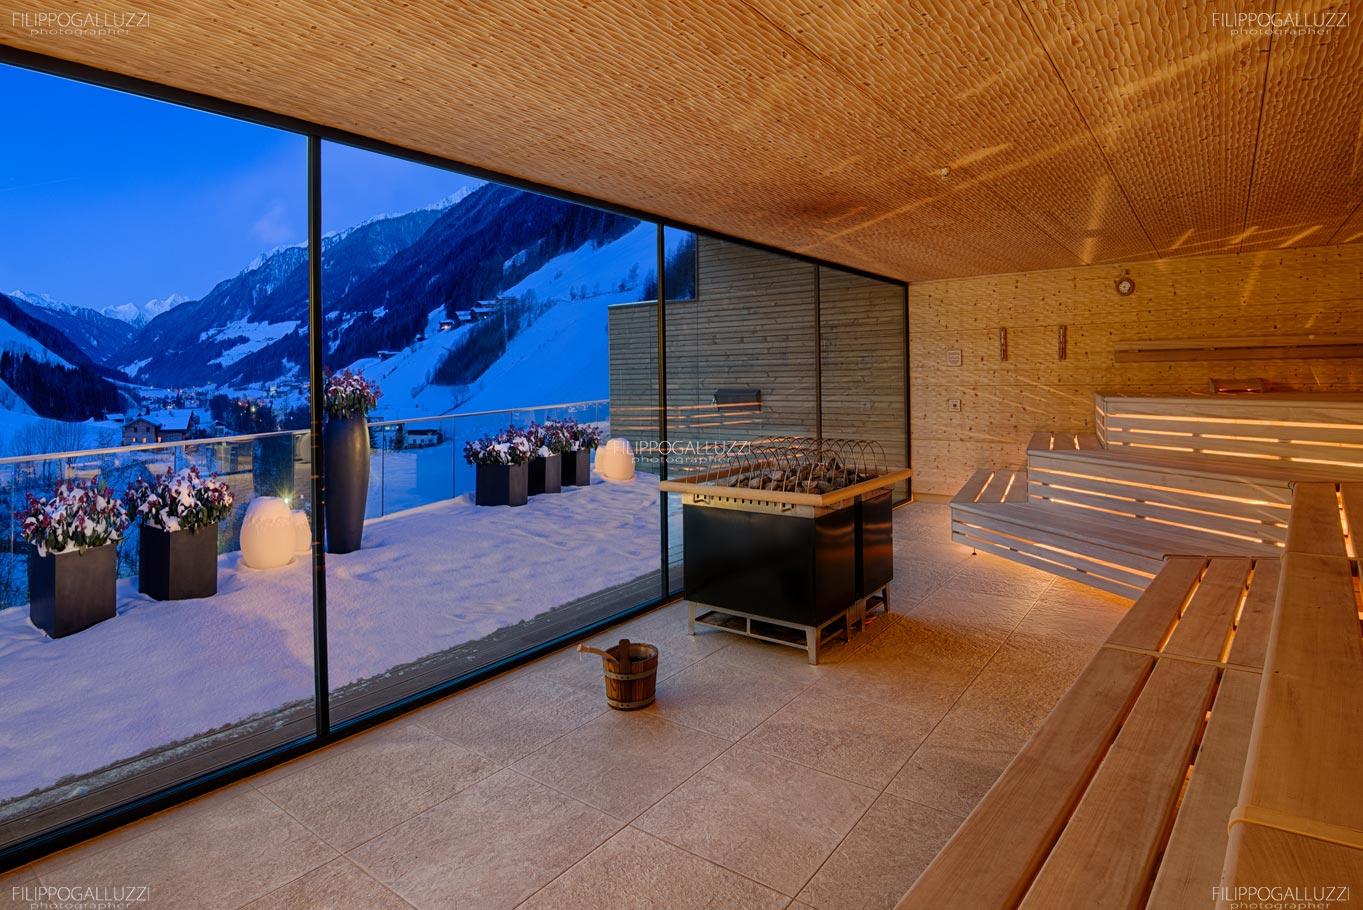 Fotografia Hotel Wellnes Panorama Sauna Alpenschloessl & Linderhof Ahrntal